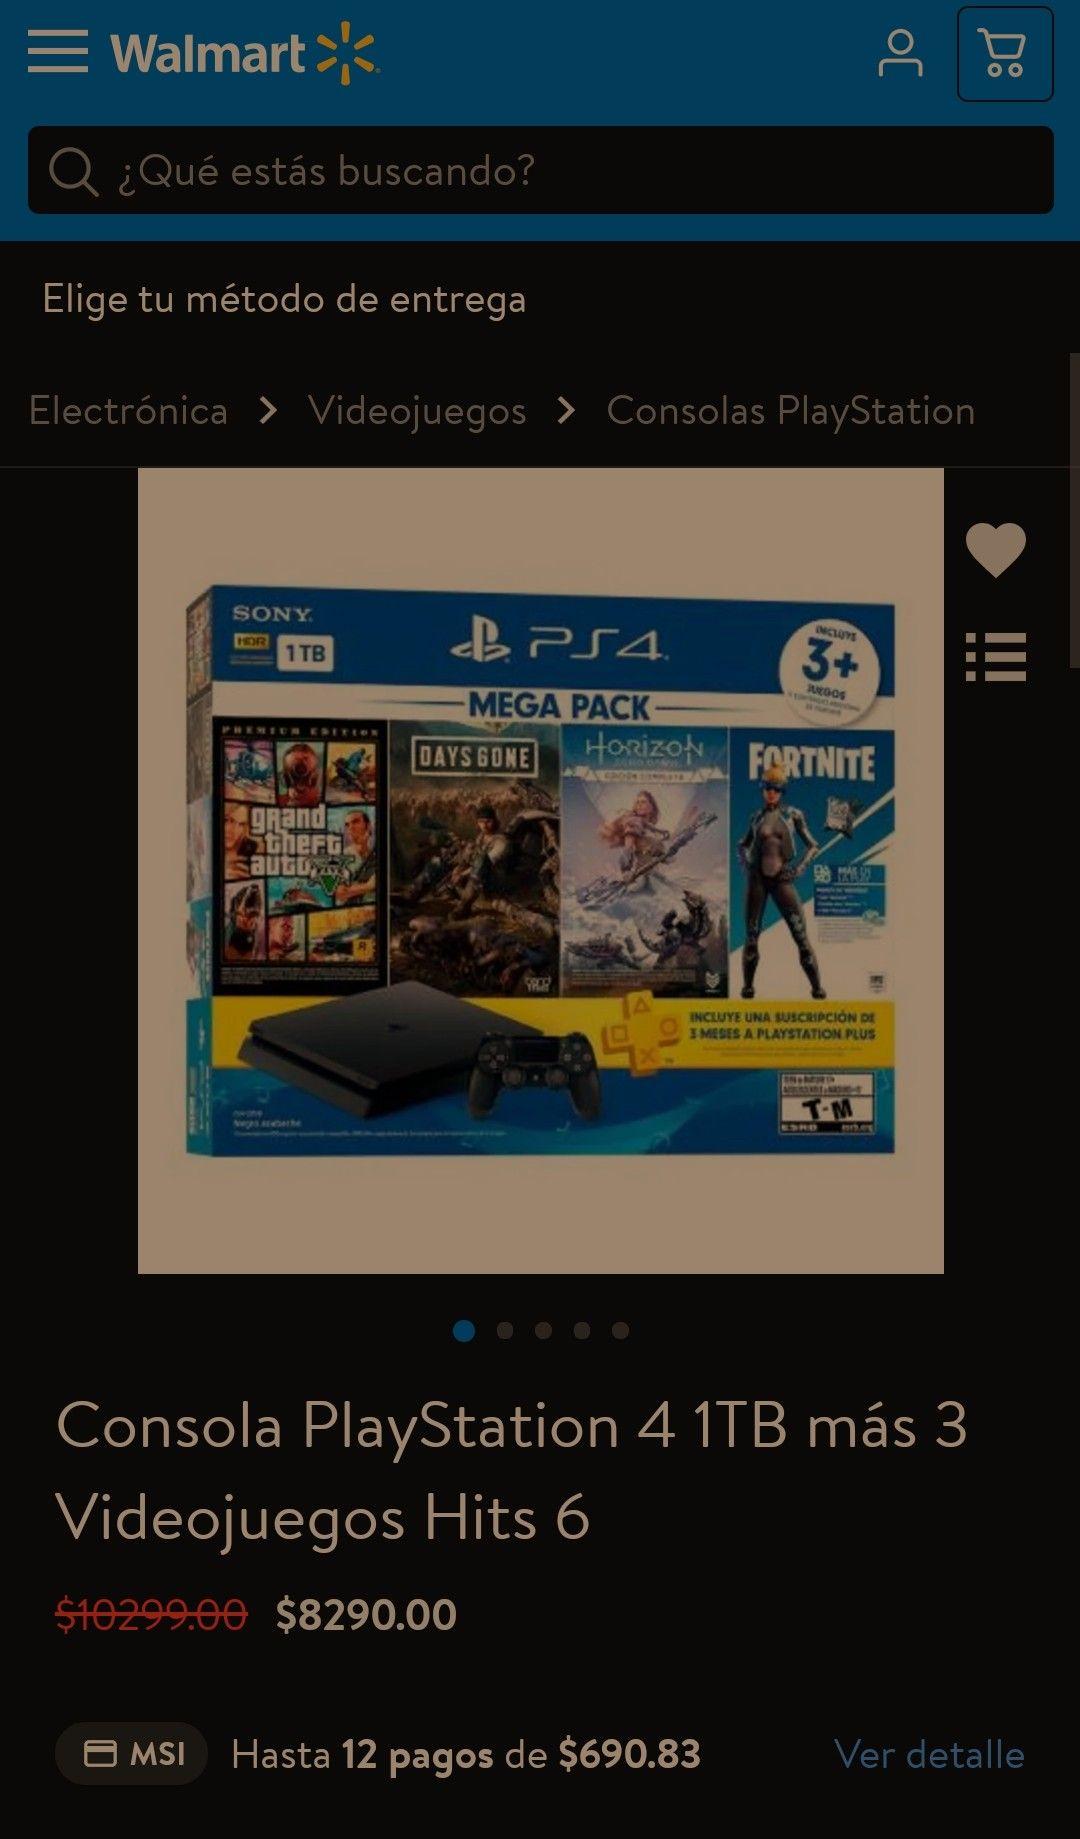 Walmart: Play Station 4 MEGAPACK